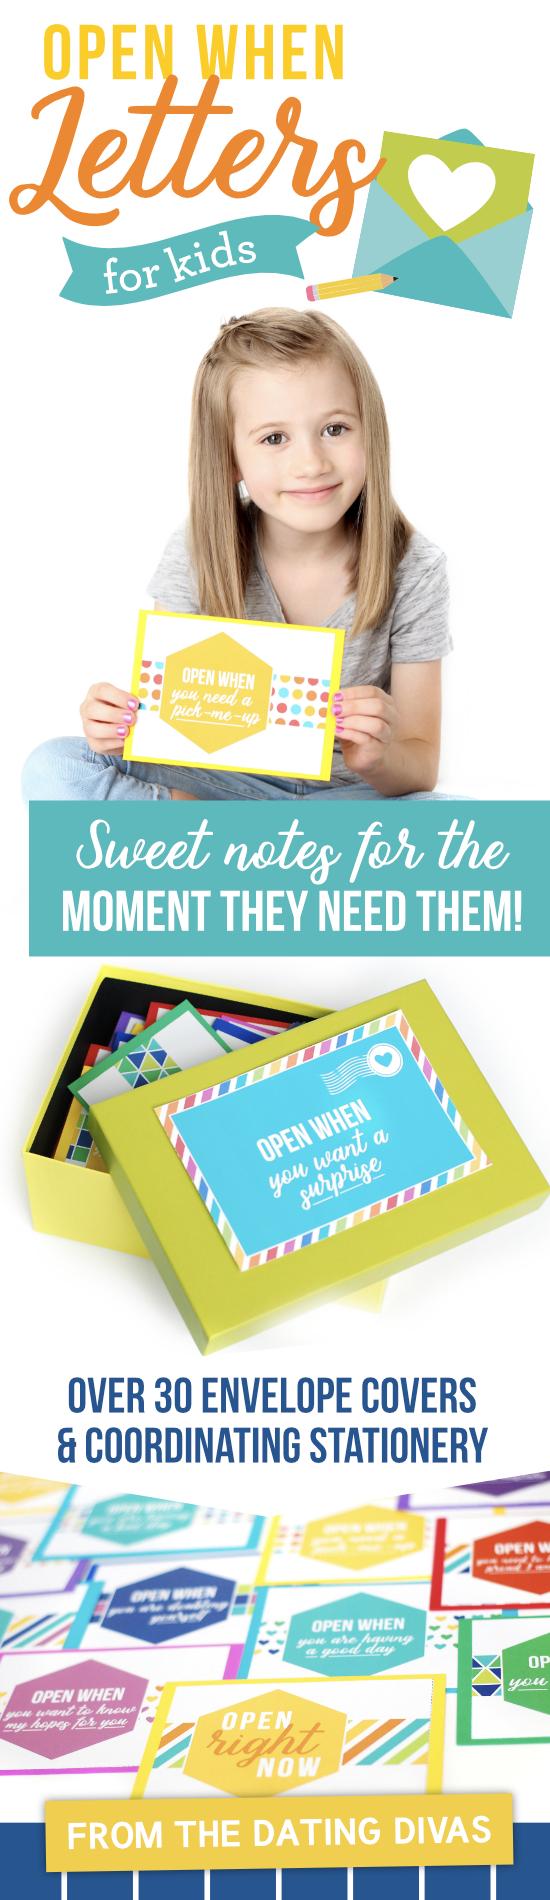 A unique gift idea for your kids!